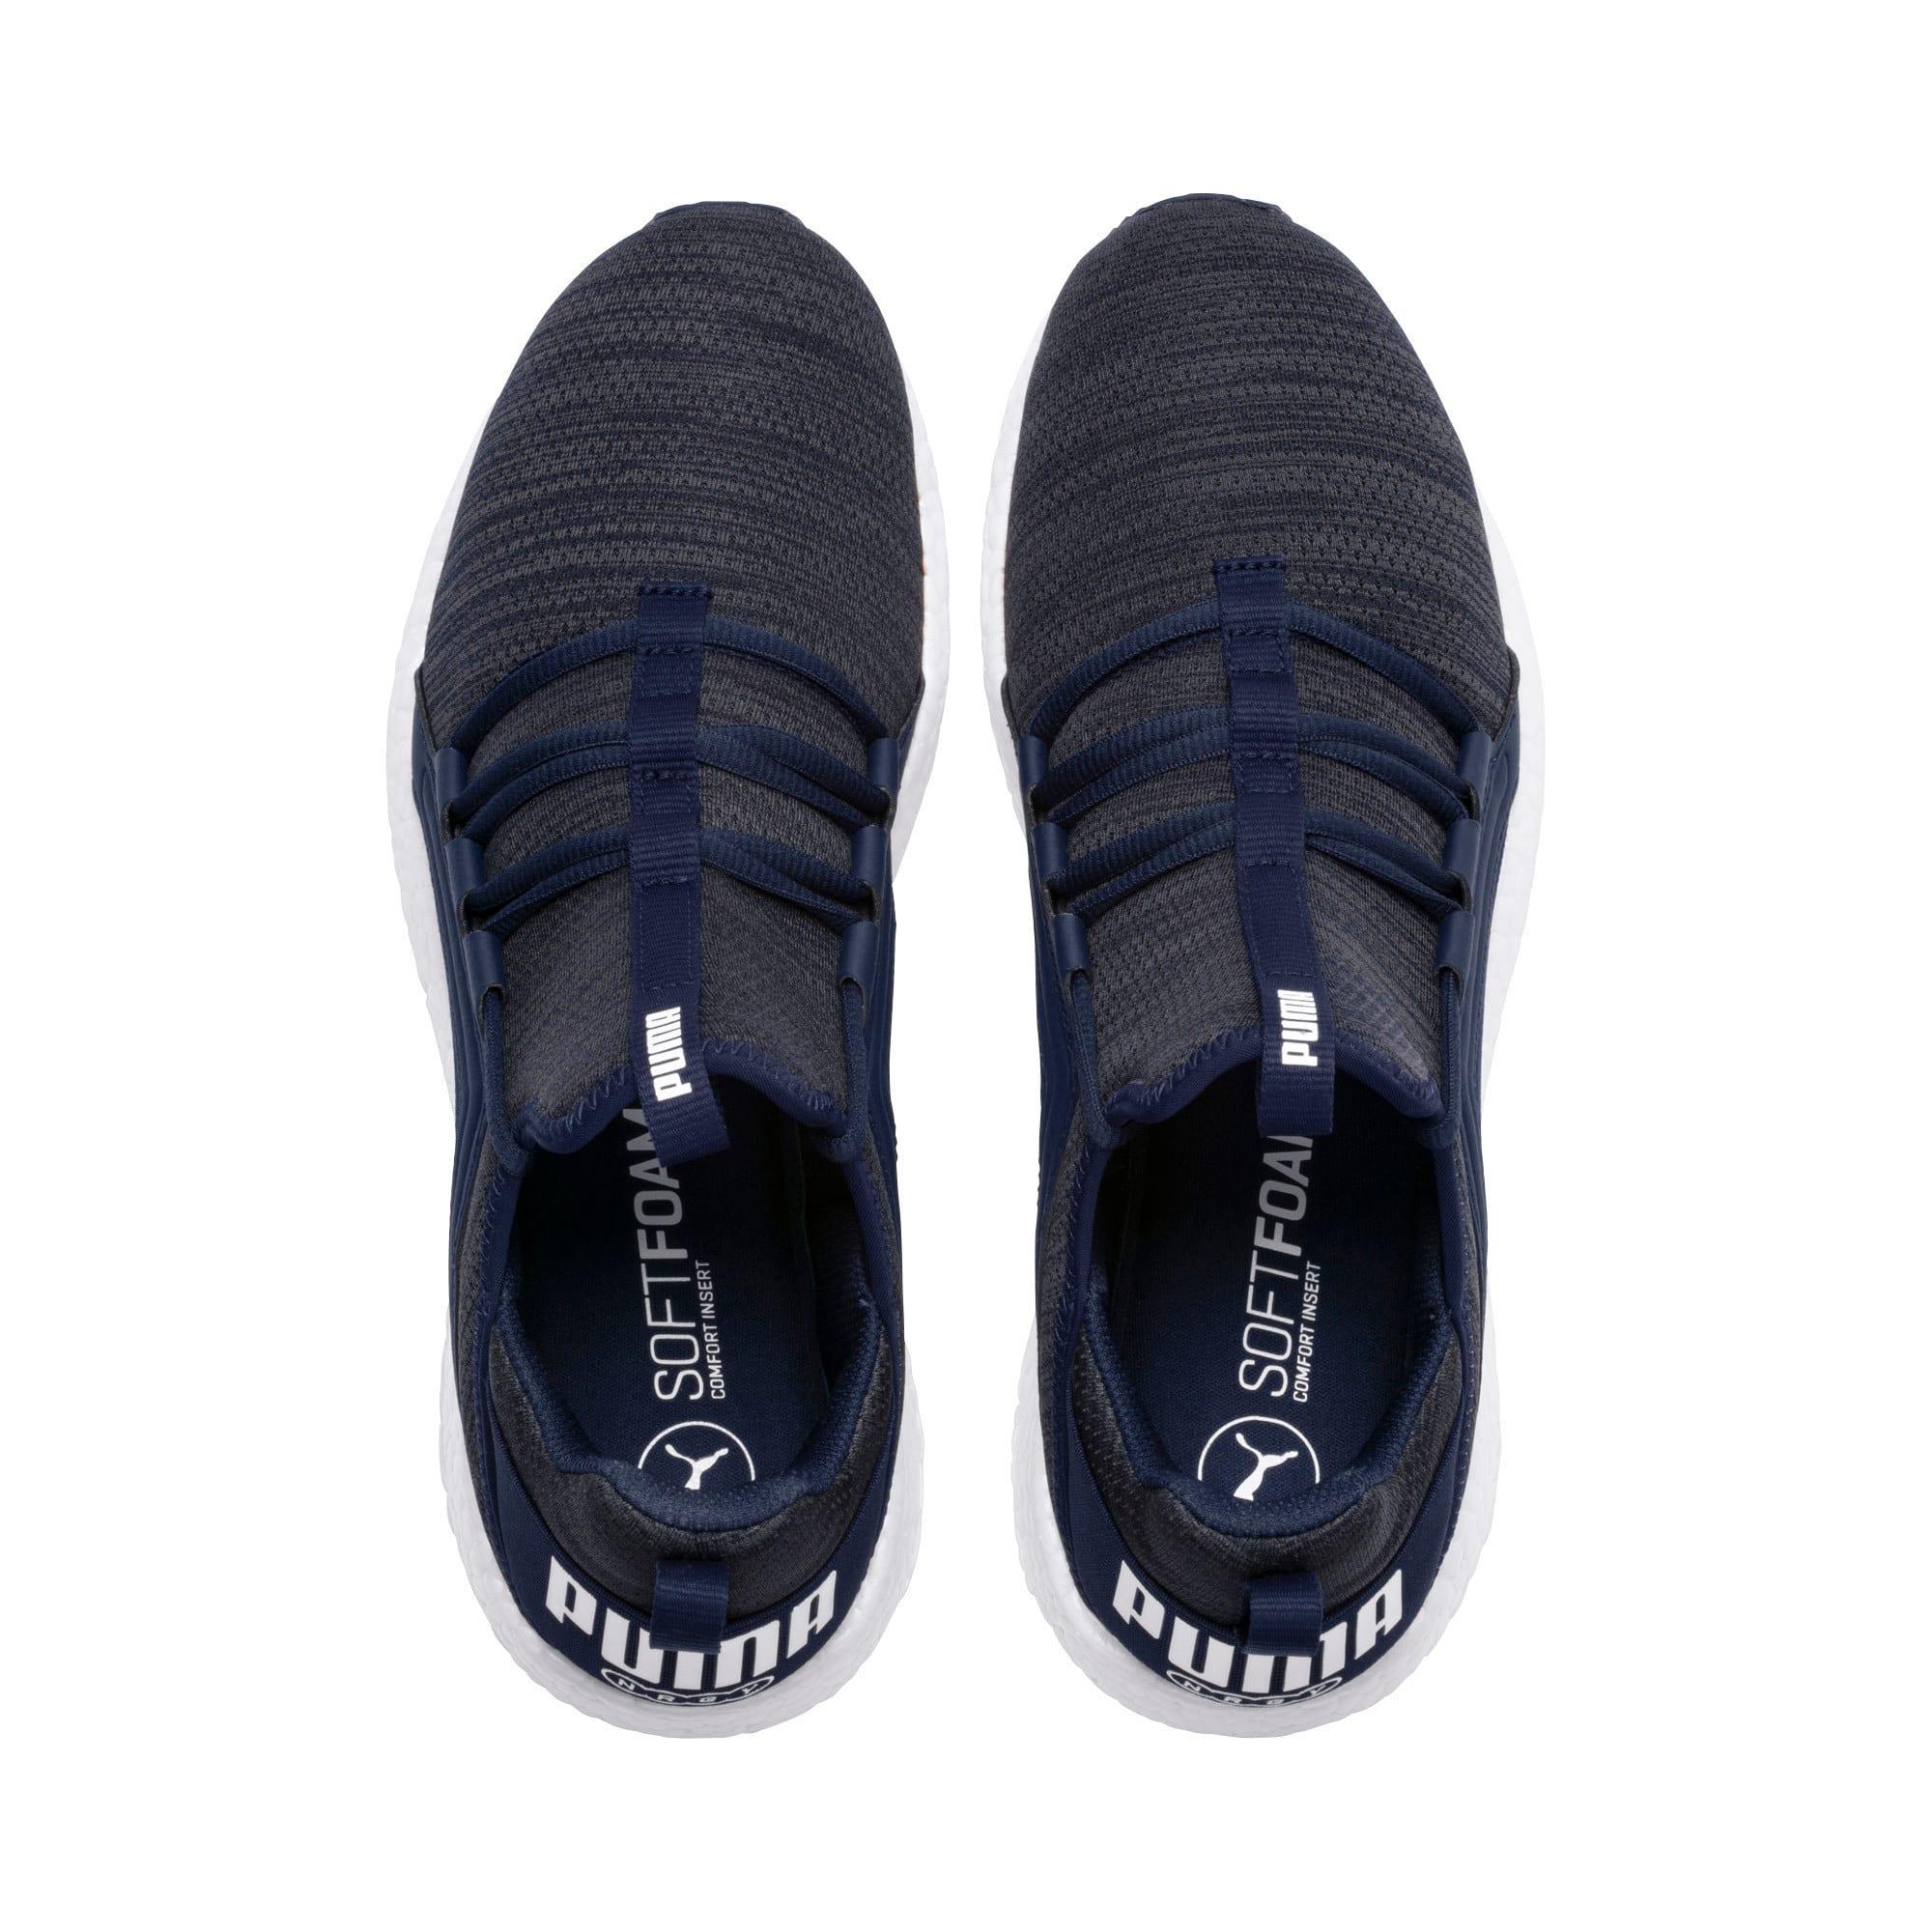 Miniatura 6 de Zapatos para correr Mega NRGY  Heather Knit para hombre, Peacoat-Iron Gate-Blanco, mediano